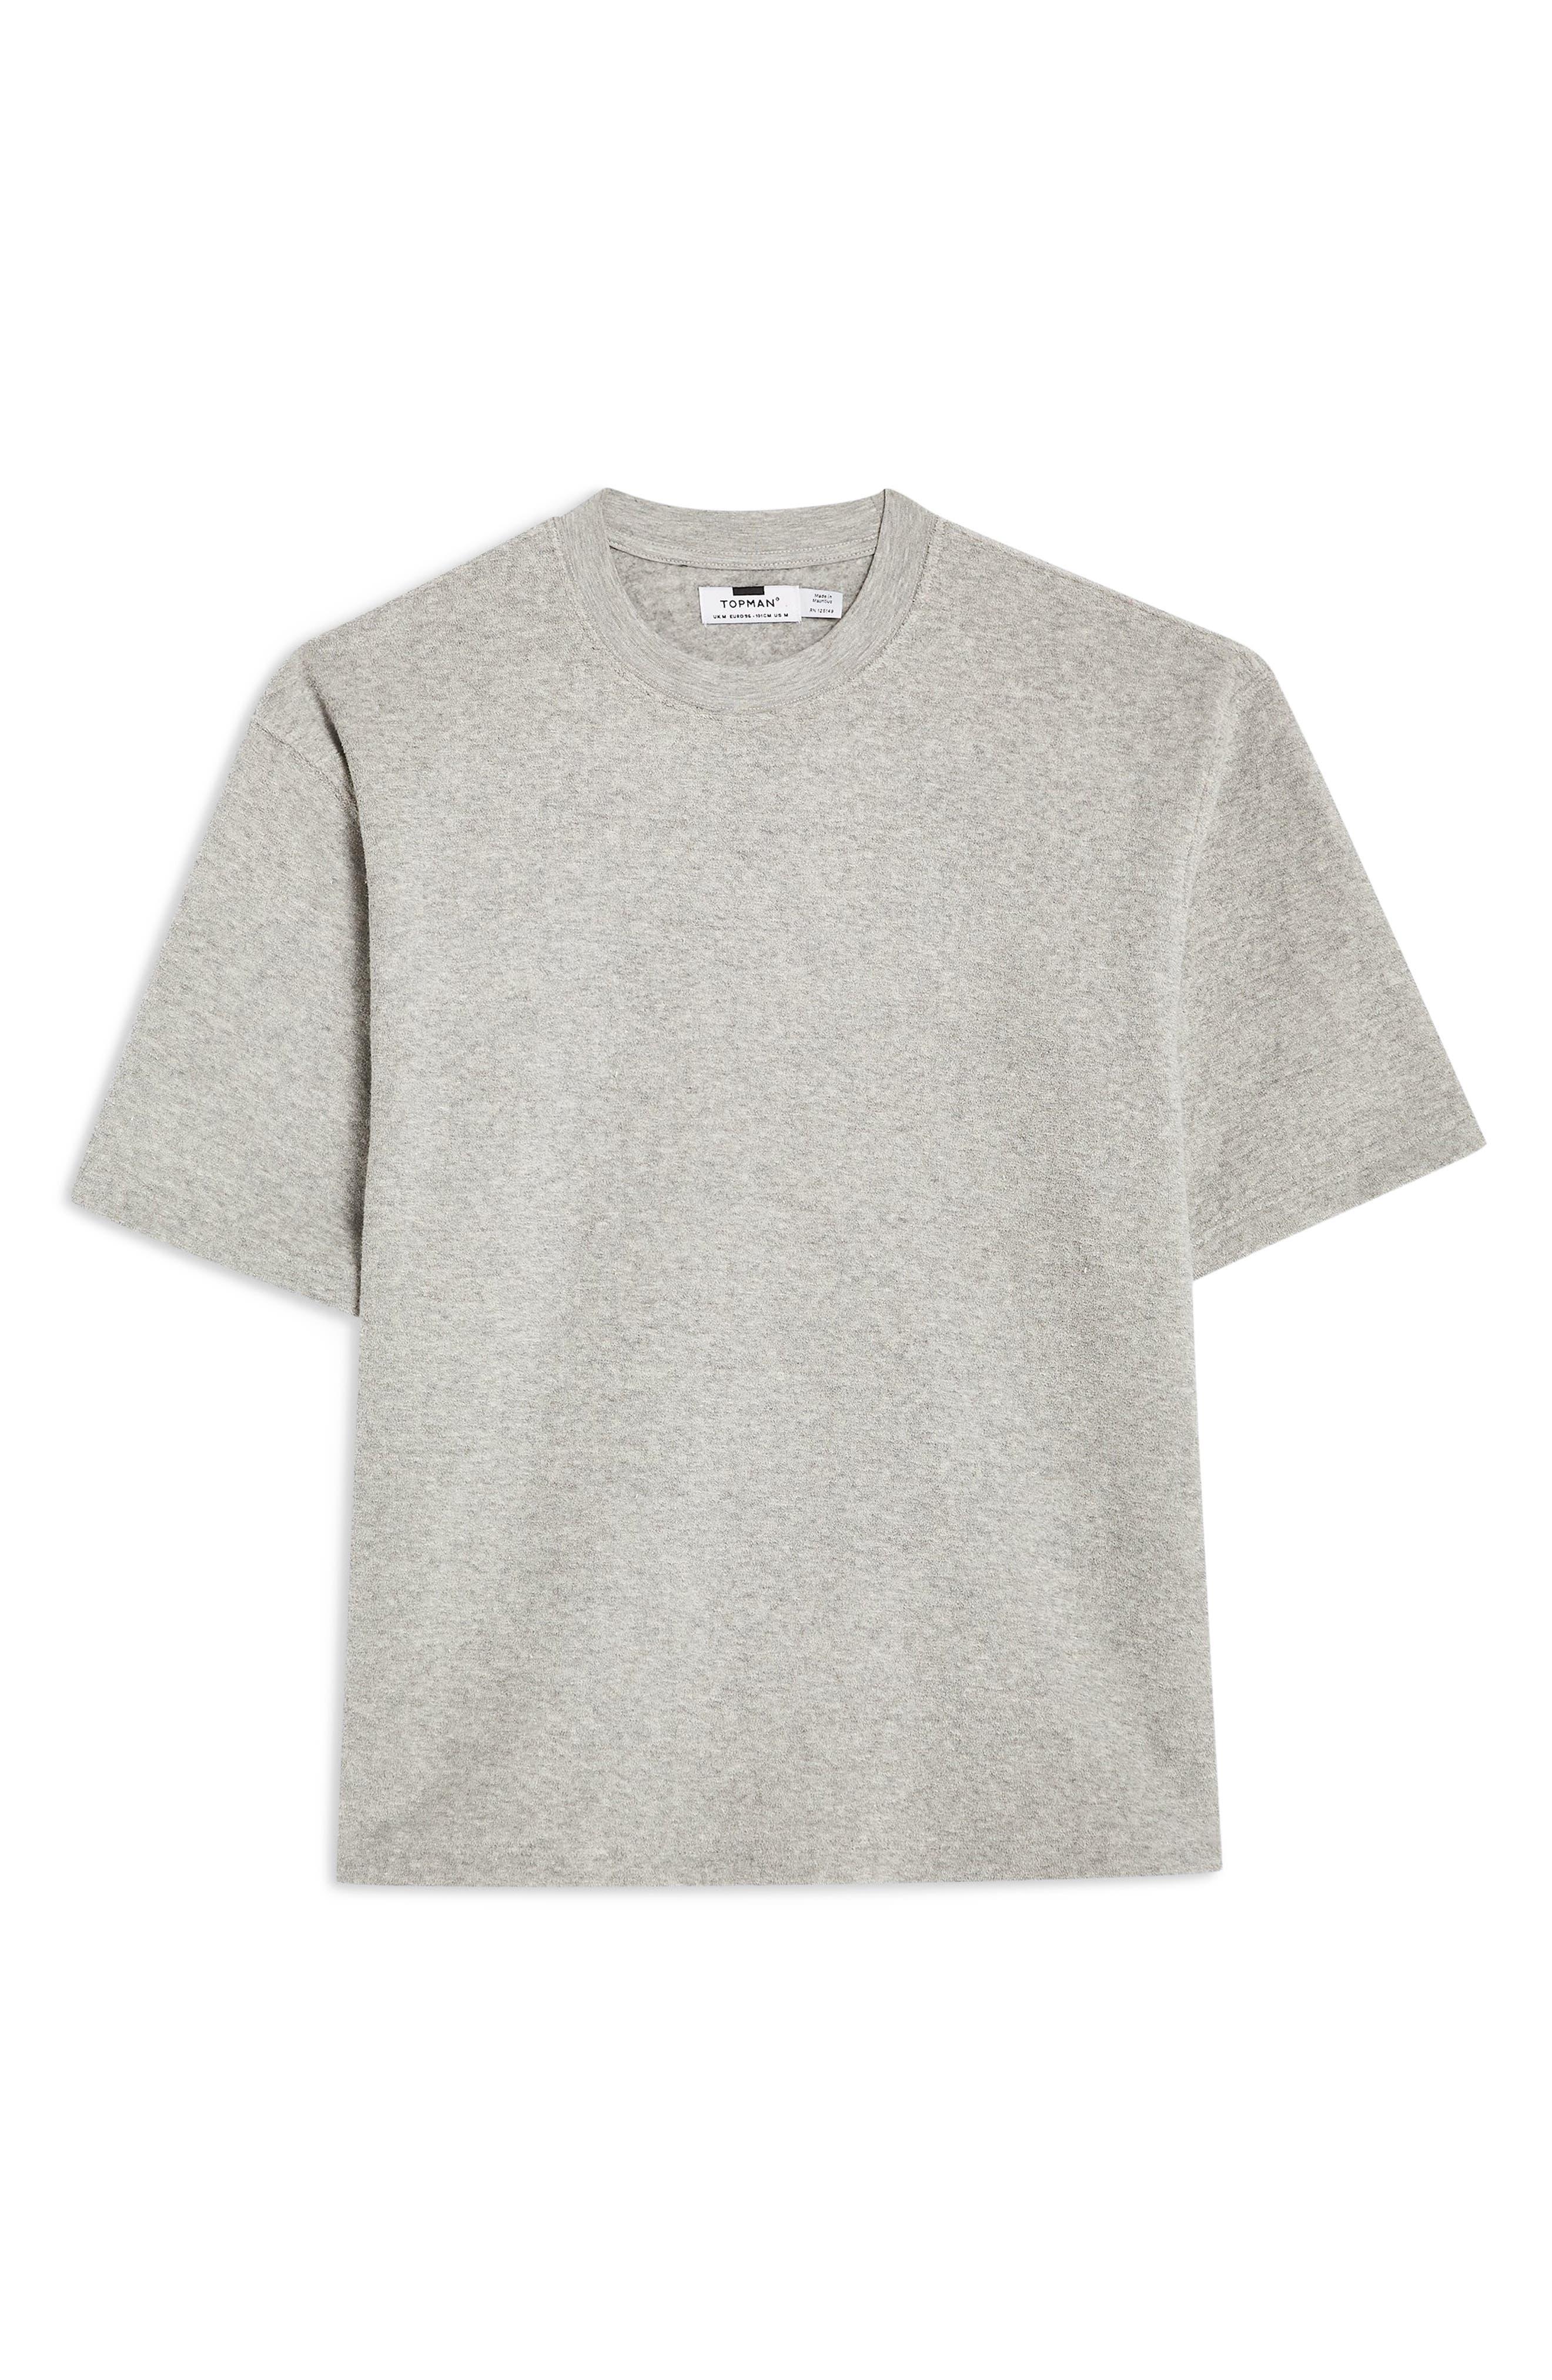 TOPMAN, Short Sleeve Terry Sweatshirt, Alternate thumbnail 3, color, GREY